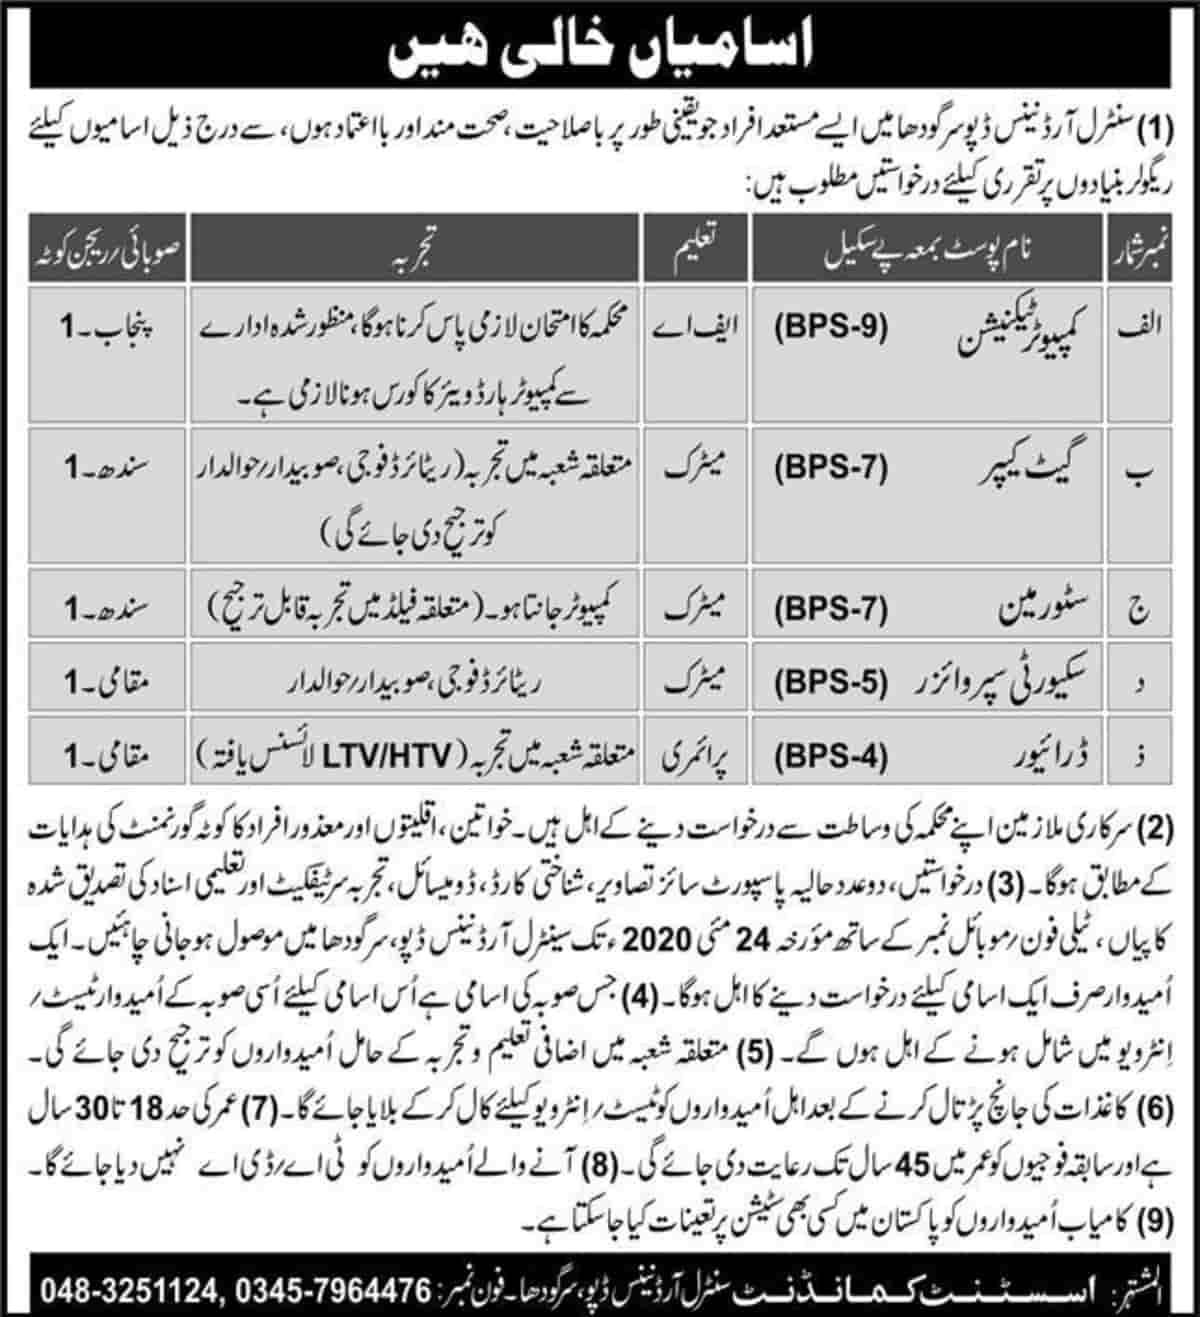 Pakistan Army Central Ordnance Depot COD Sargodha Jobs May 2020 Latest